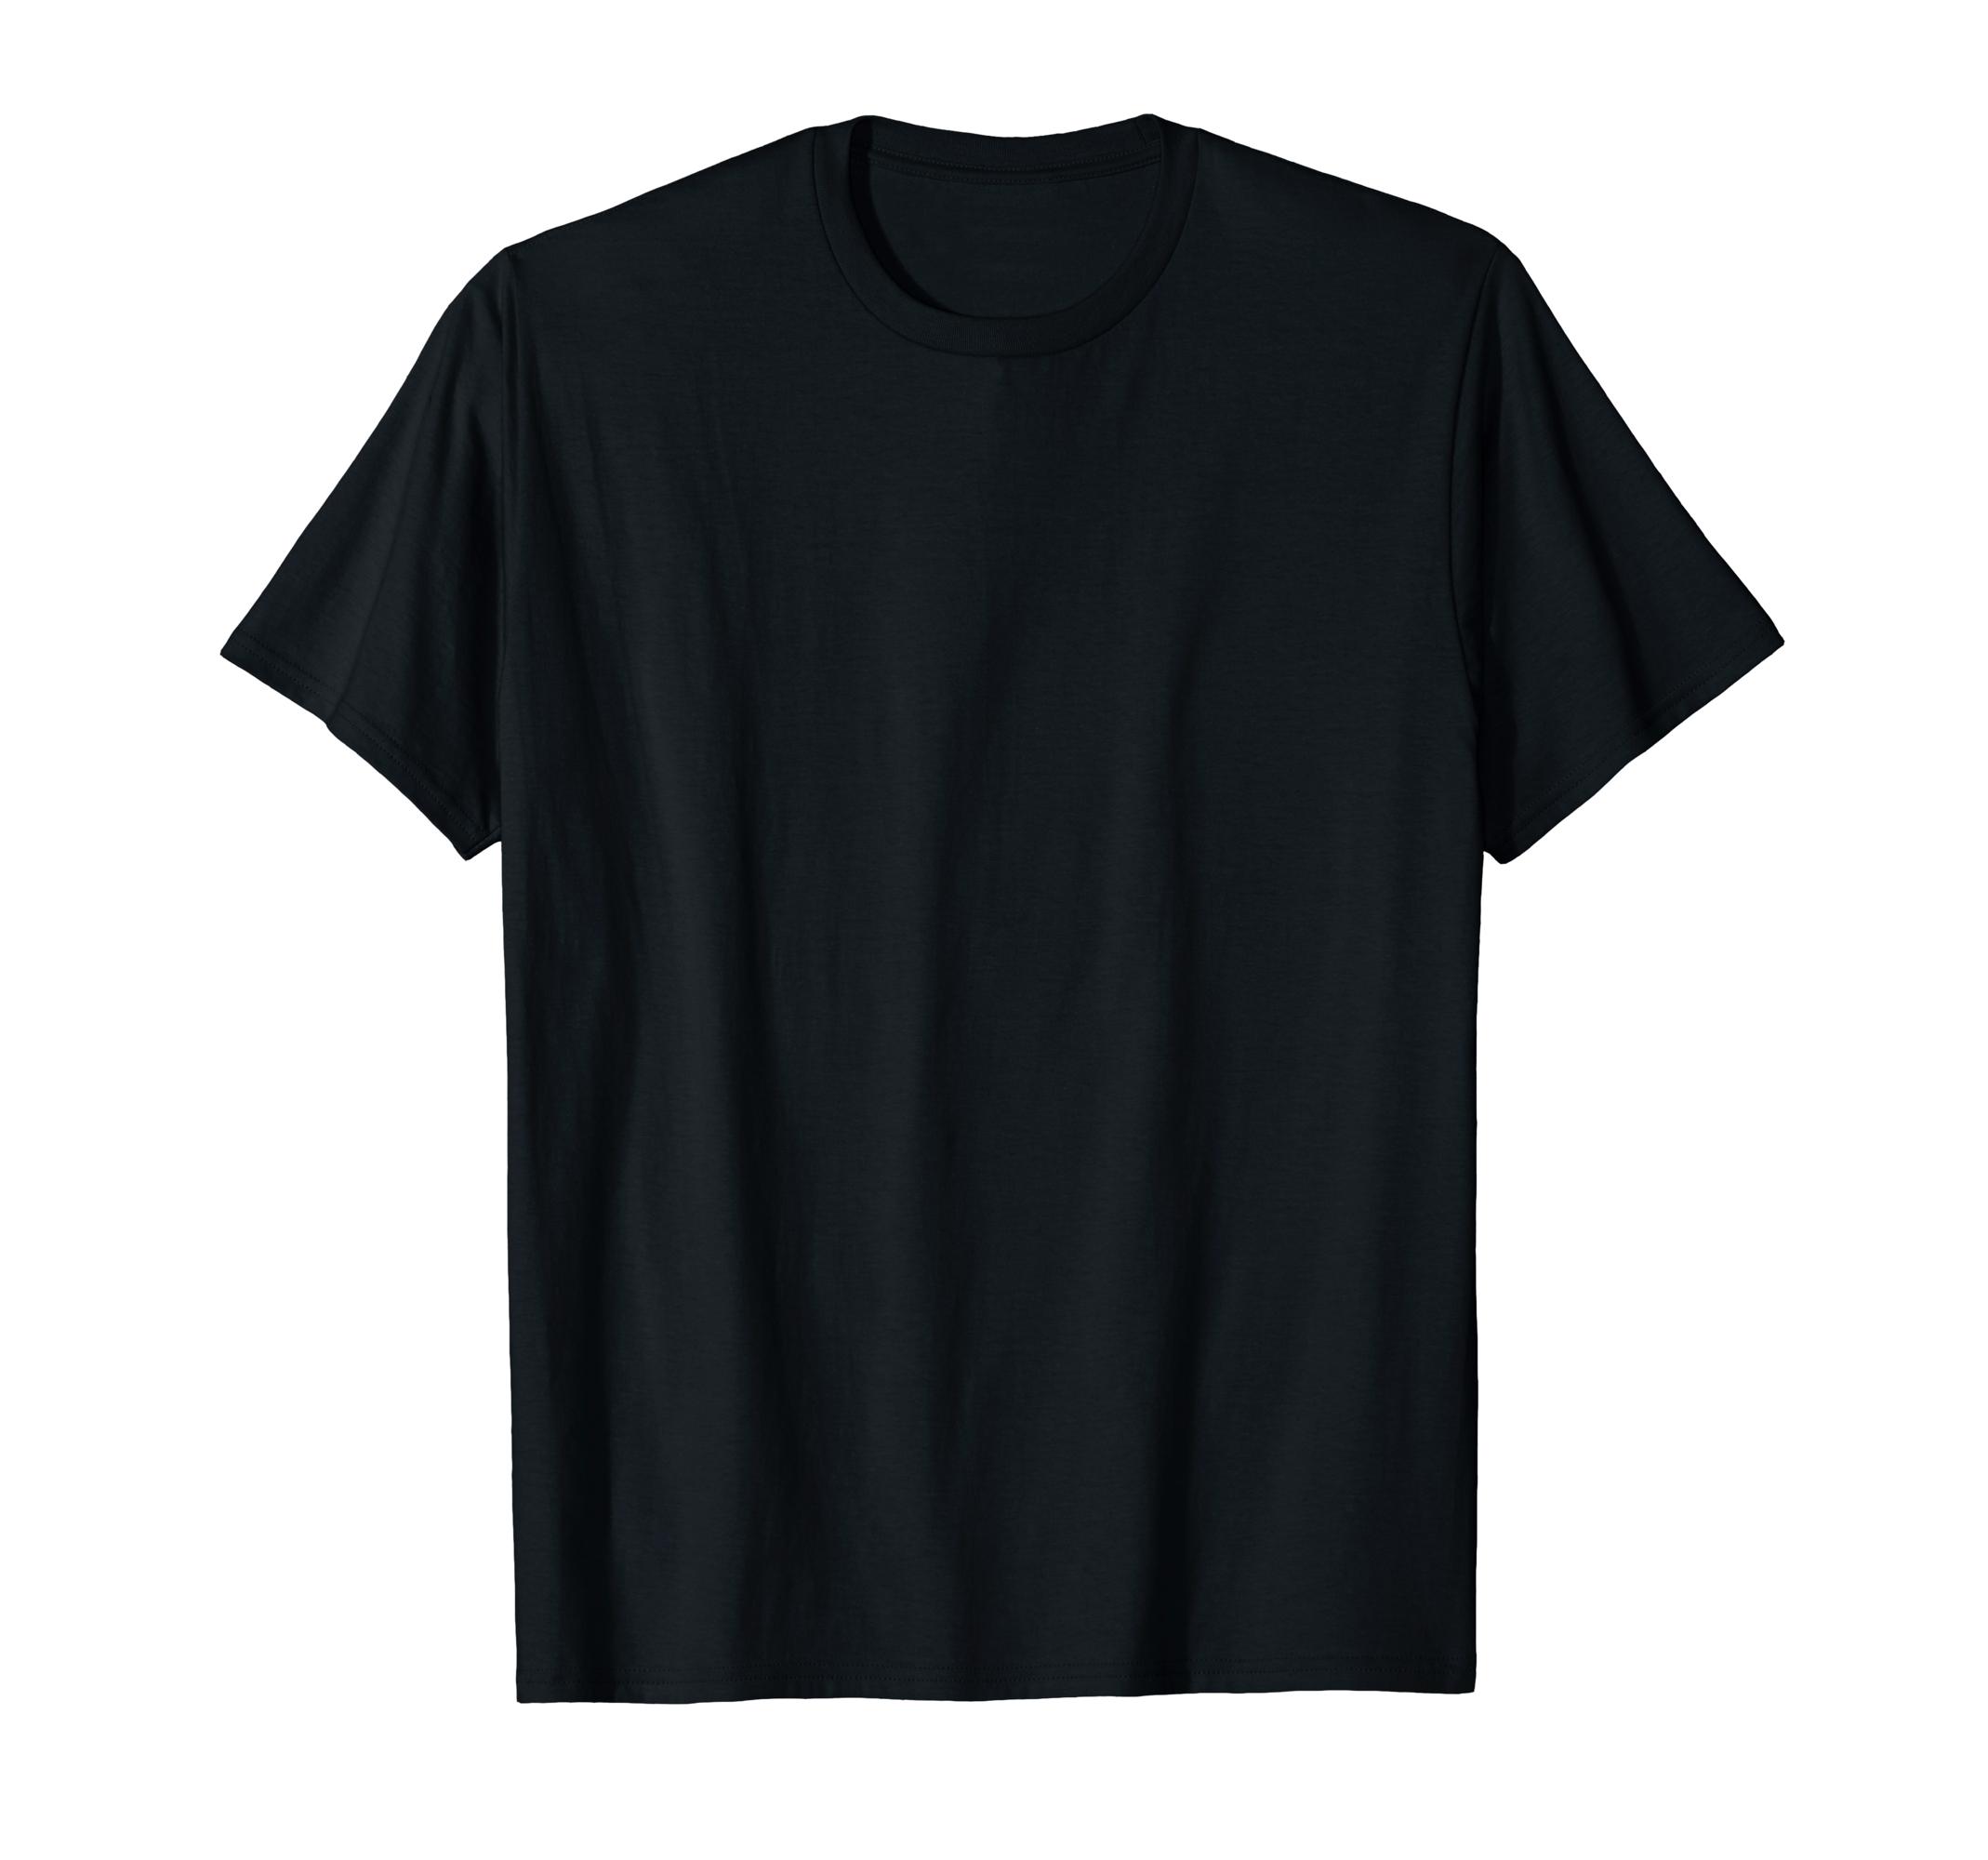 Shirts Mens ROYAL BANK of DAD Tshirt Fathers Day Gift Funny Christmas Present Idea